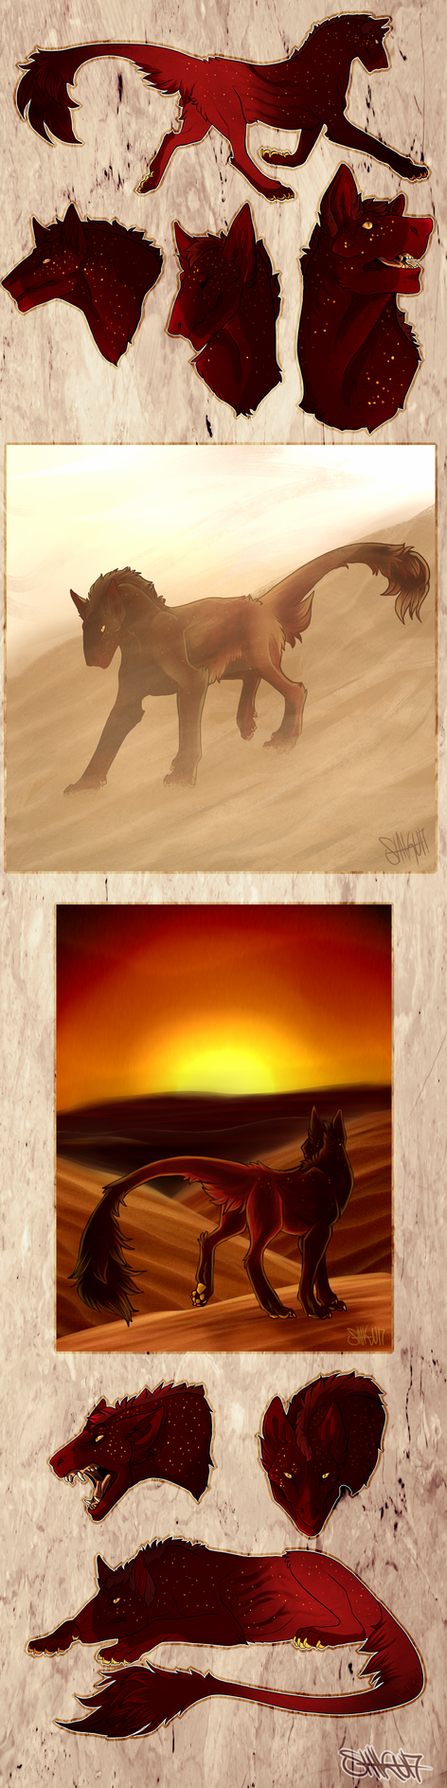 Red Desert by Smilefacekranaatti